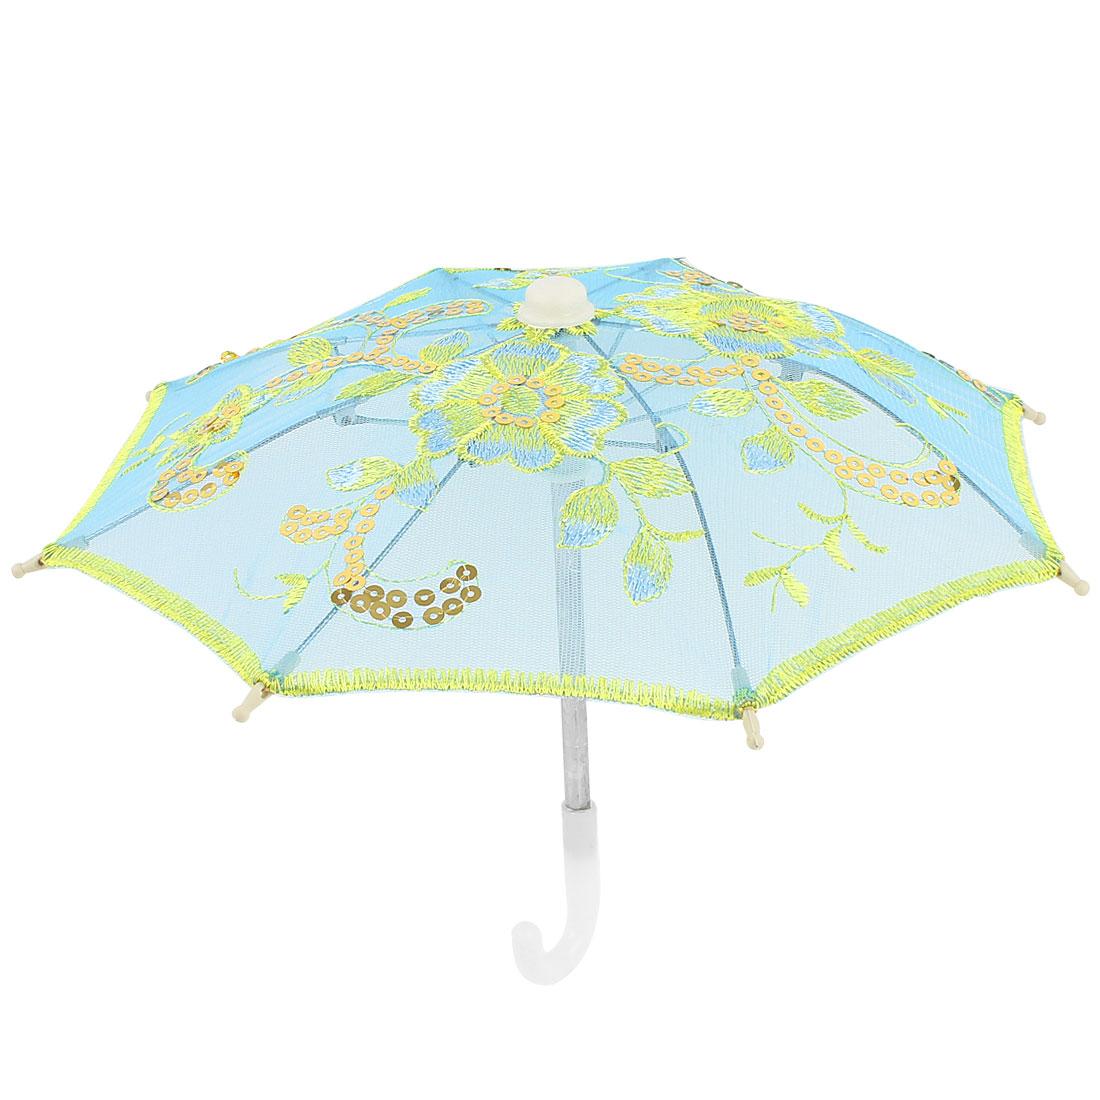 Home Decor Gold Tone Embroidery Flower Foldable Mini Parasol Umbrella Blue